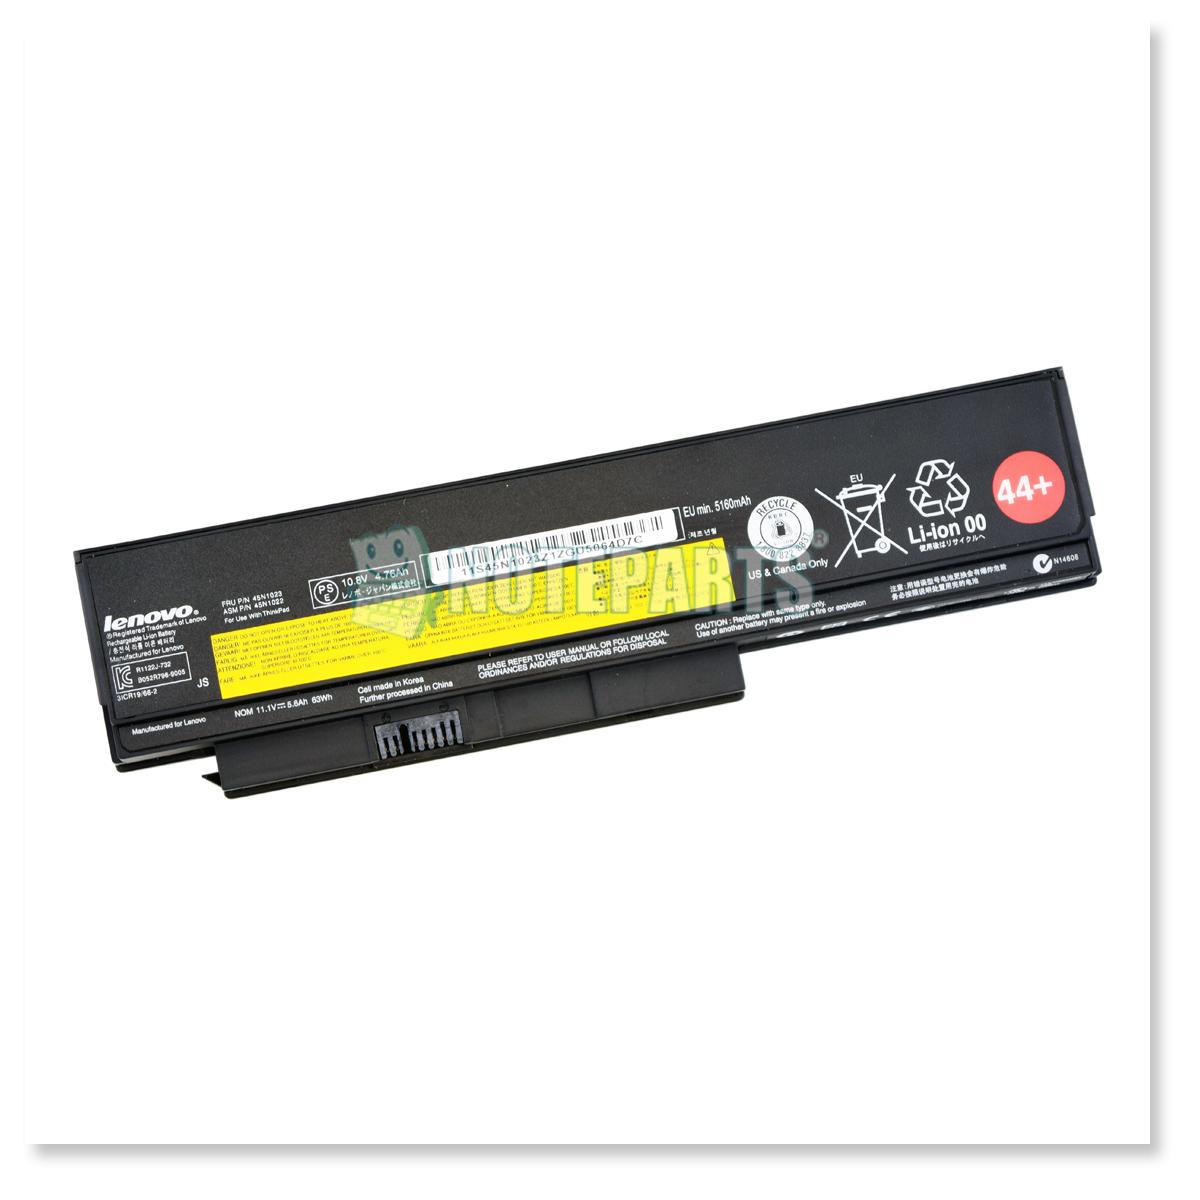 Lenovo純正 ThinkPad バッテリー 44+ (6セル) X230 0A36306